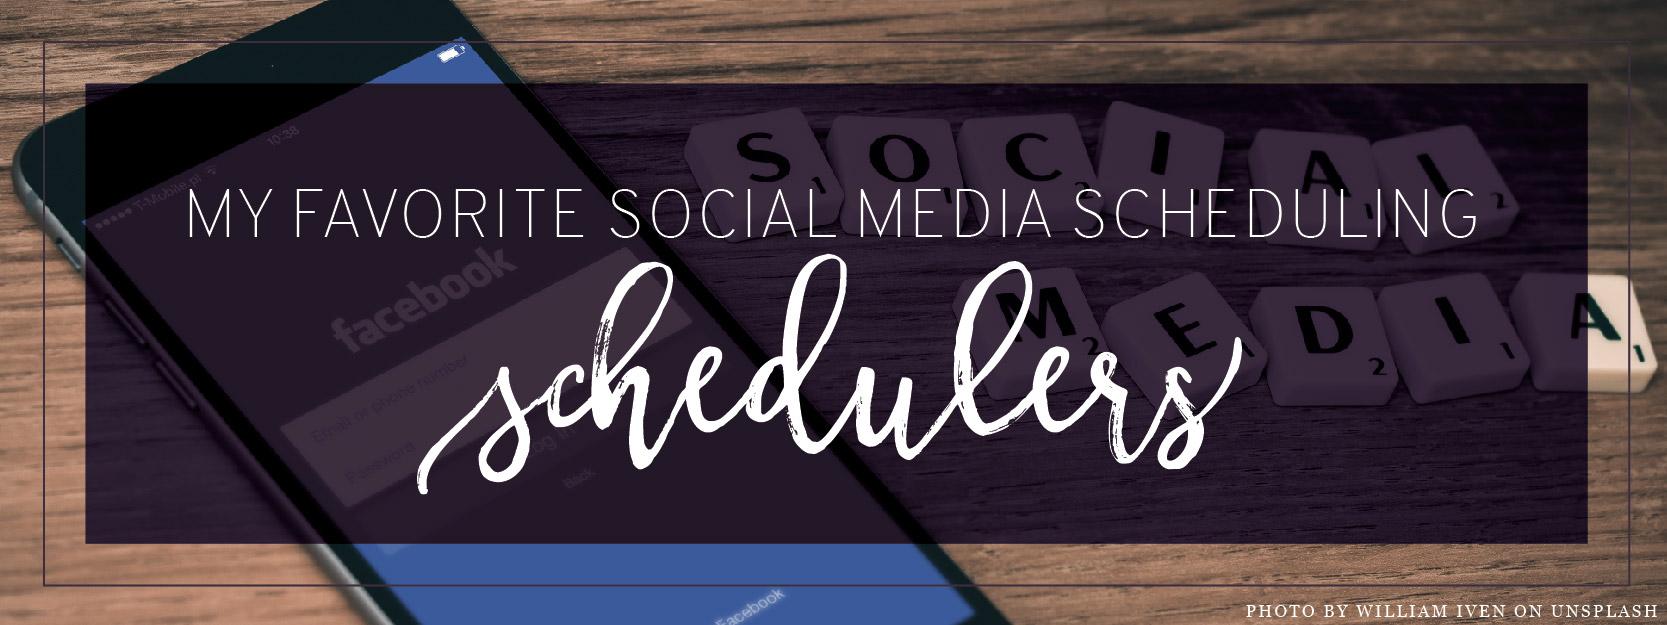 Favorite Social Media Schedulers Header